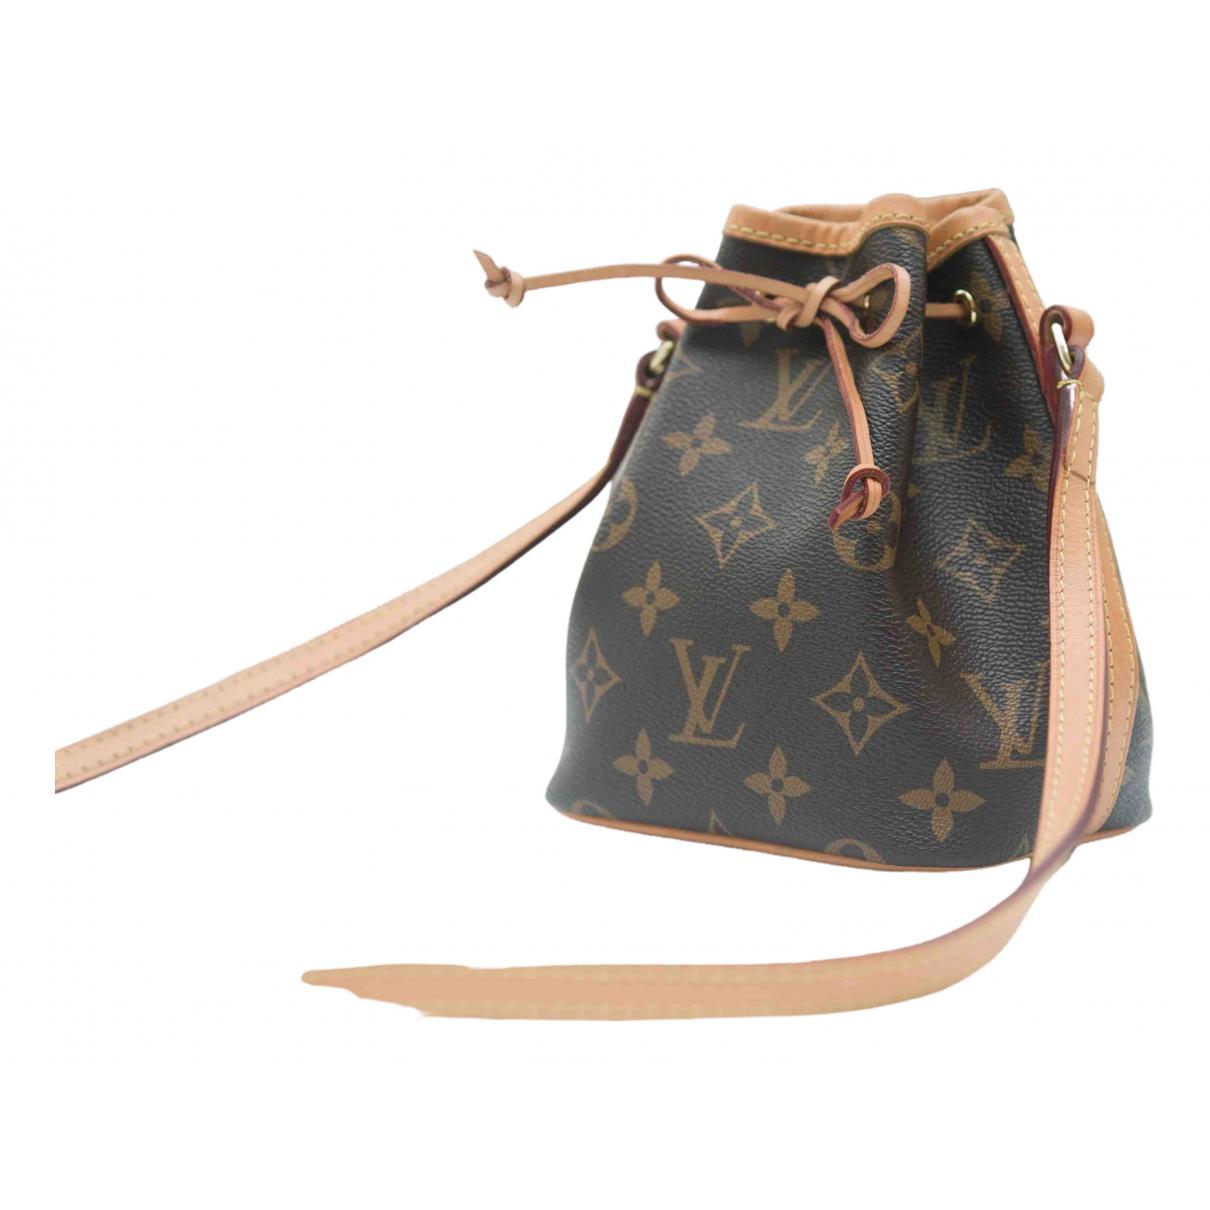 Pochette Noe de Cuero Louis Vuitton